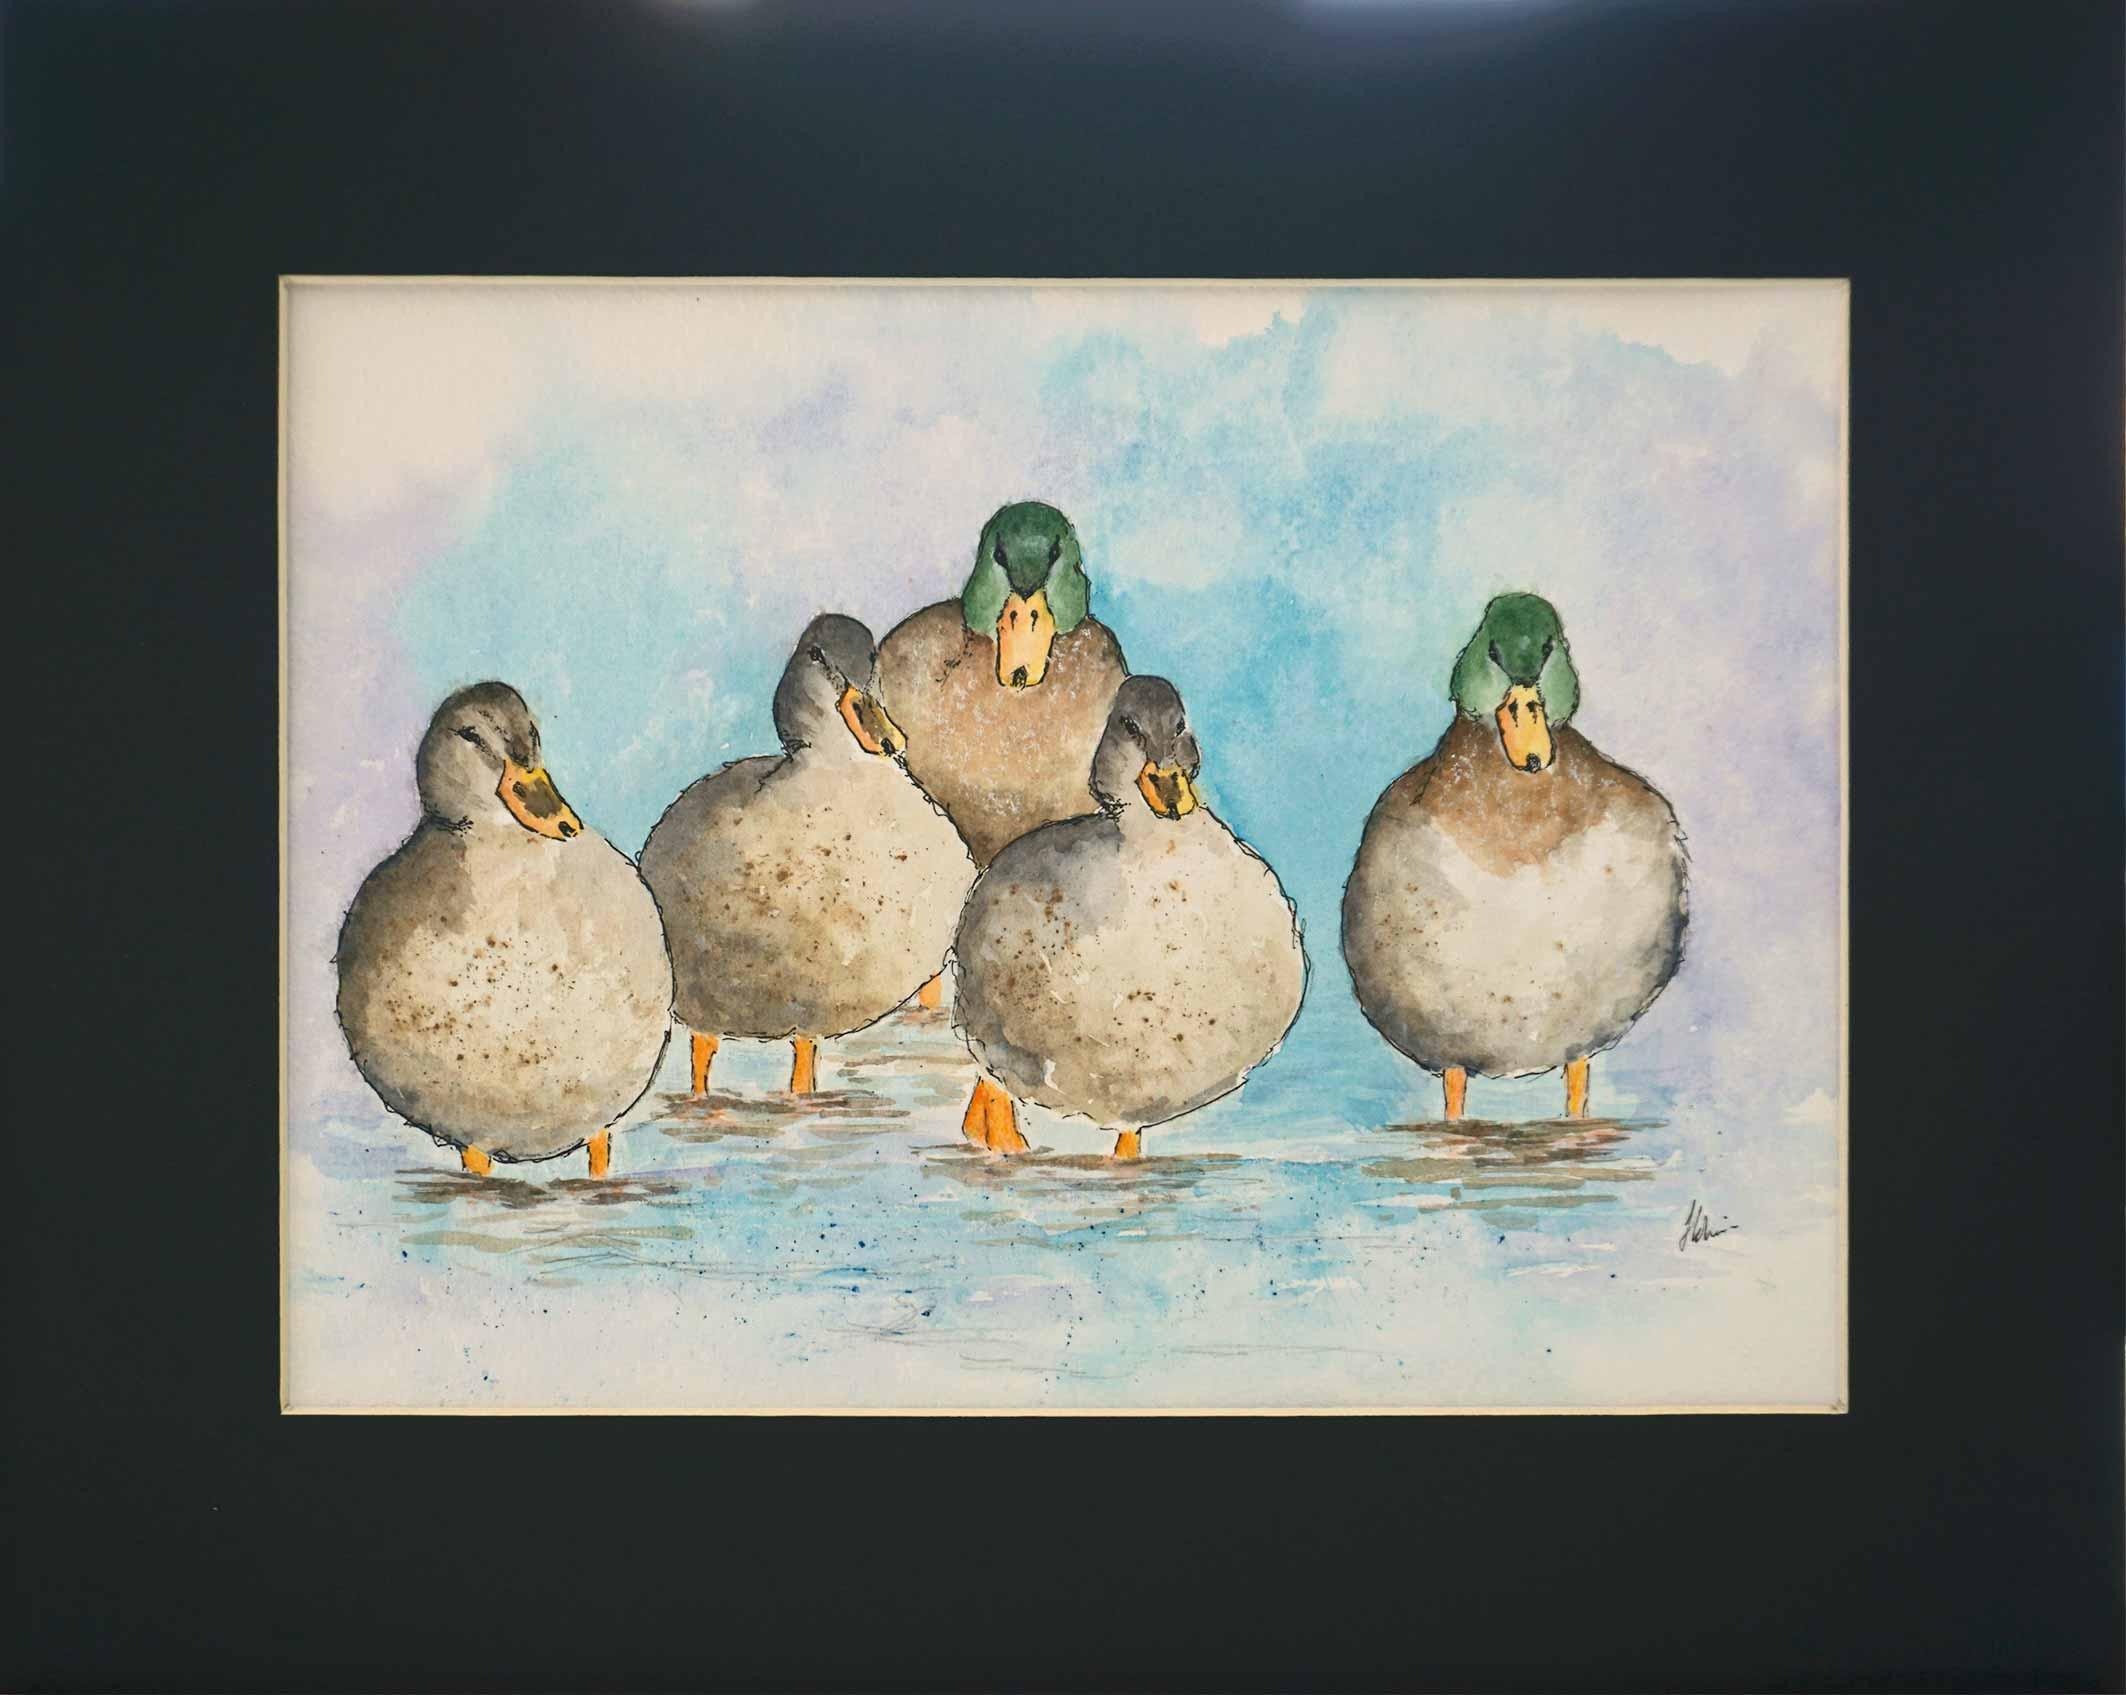 watercolour of five ducks